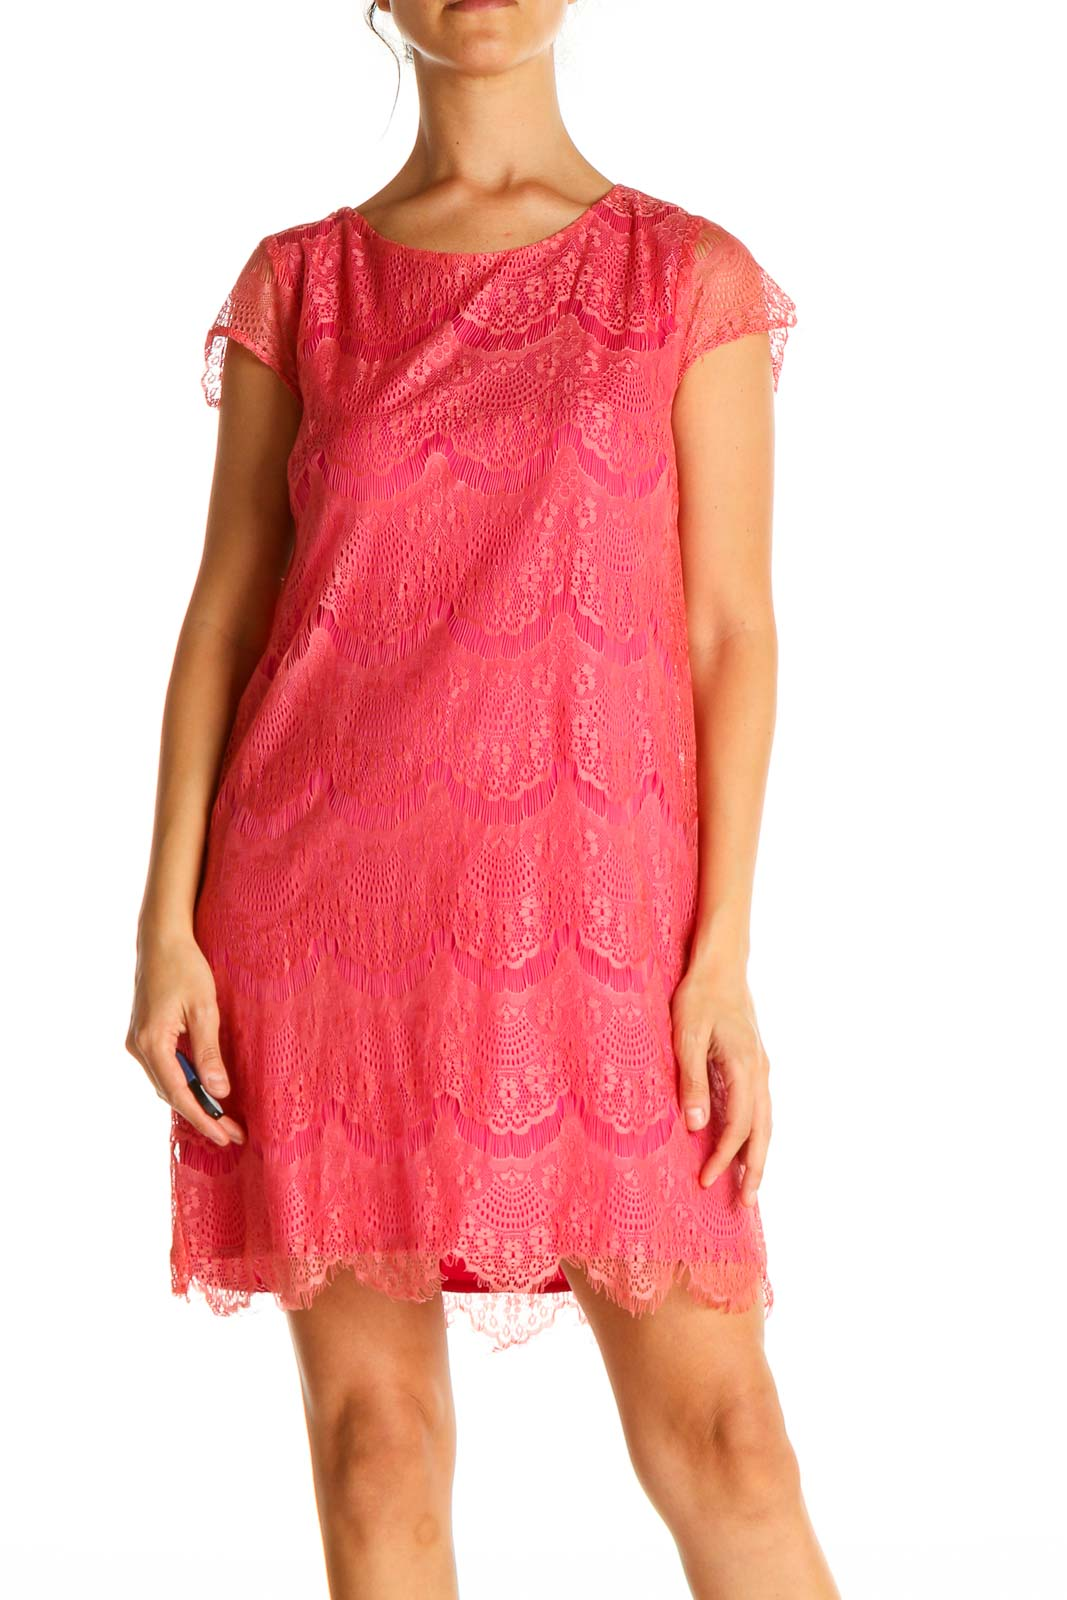 Pink Lace Retro A-Line Dress Front